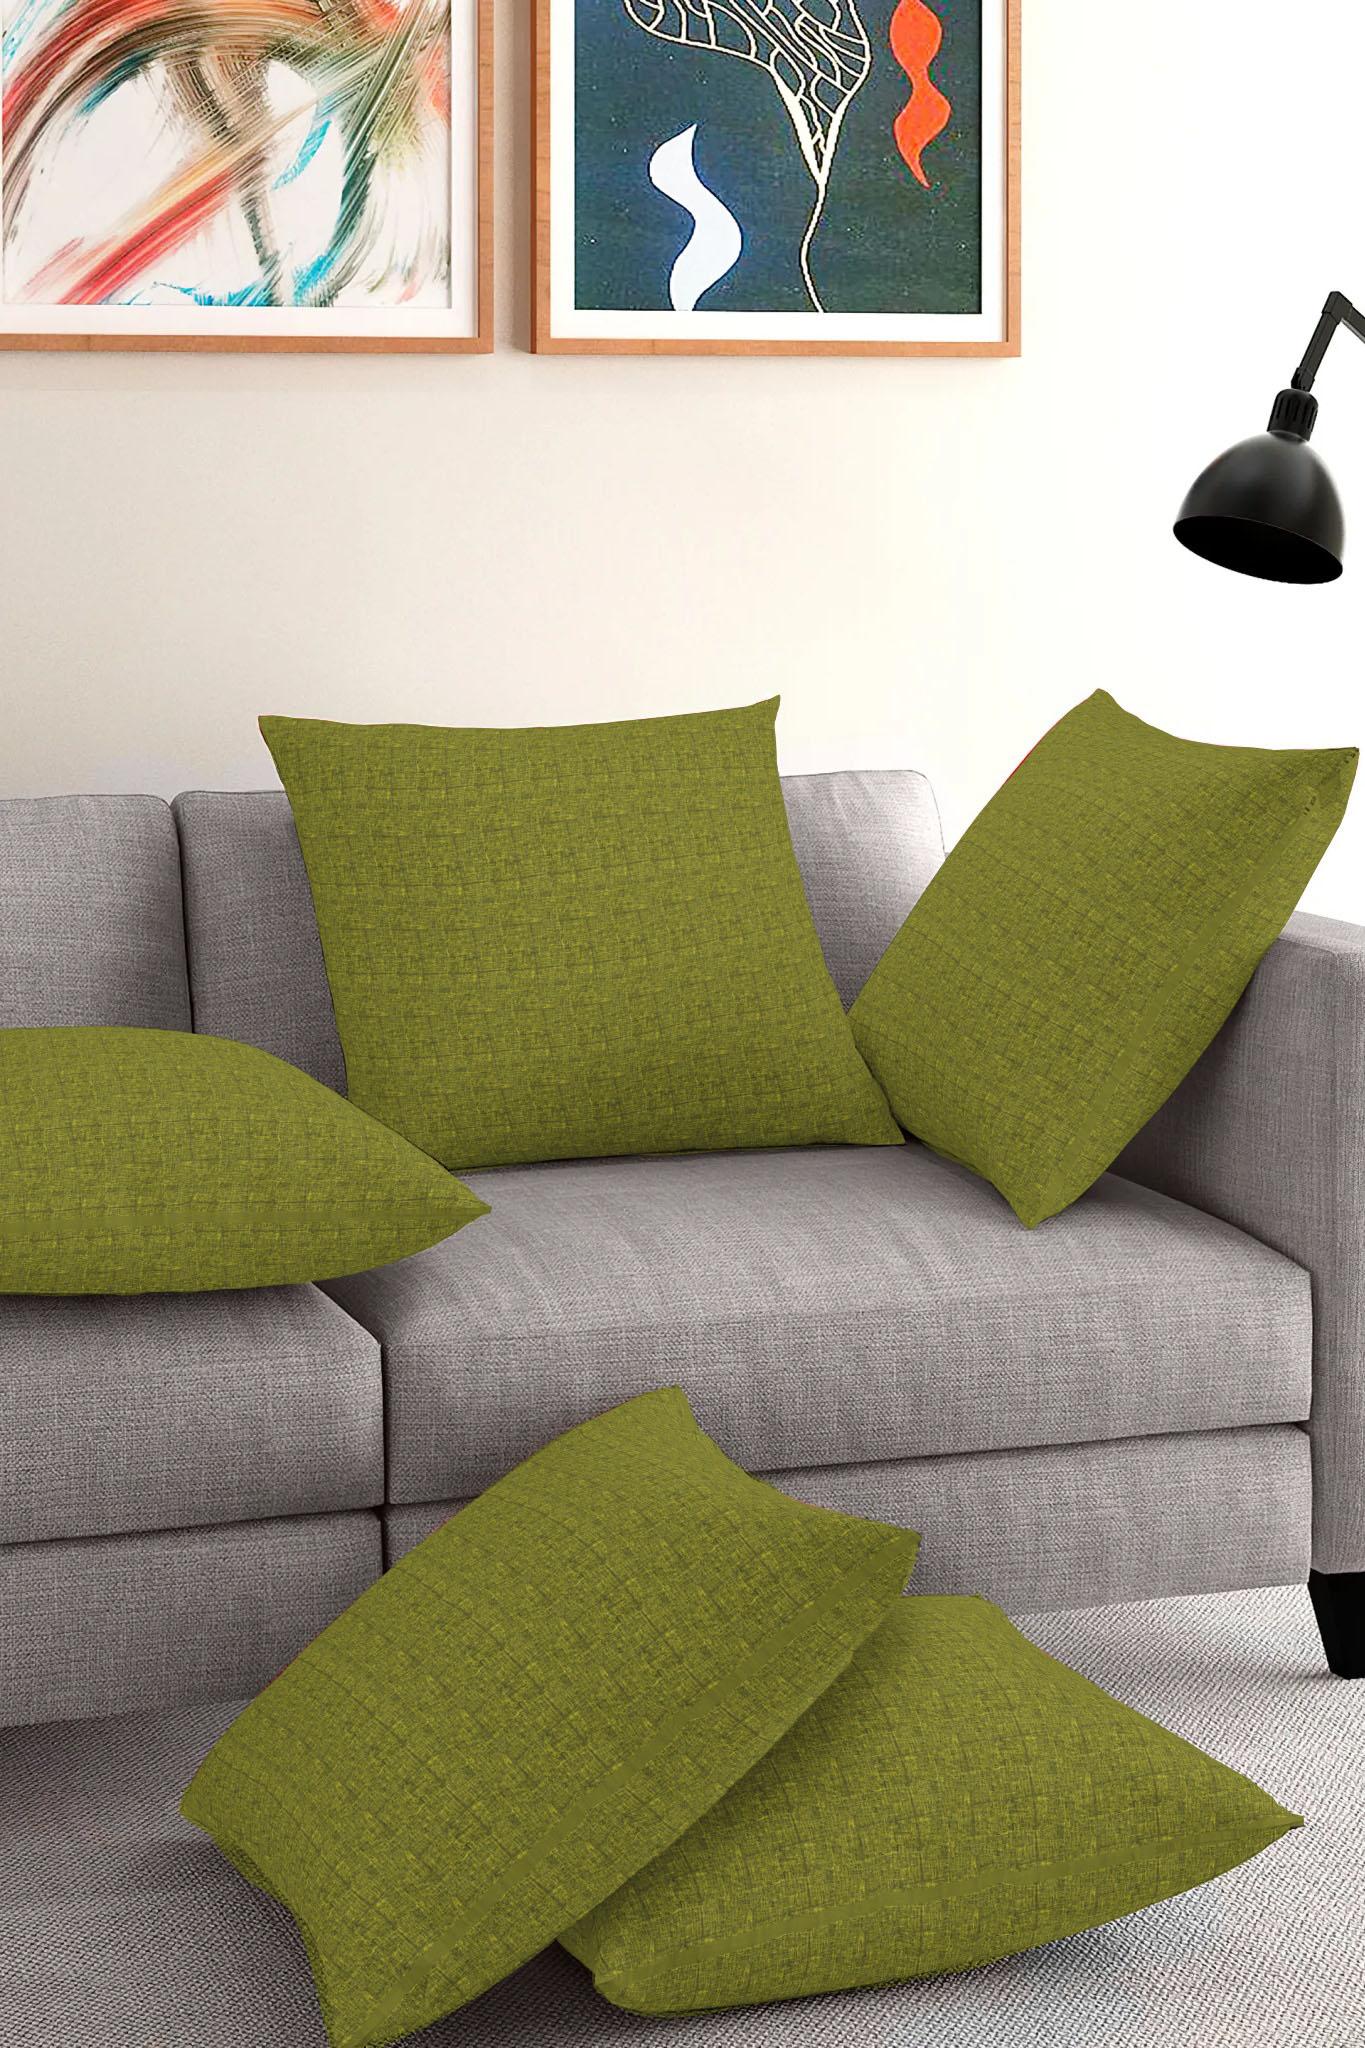 /home/customer/www/fabartcraft.com/public_html/uploadshttps://www.shopolics.com/uploads/images/medium/Olive-Green-Black-Cotton-Cushion-Cover-35387.jpg